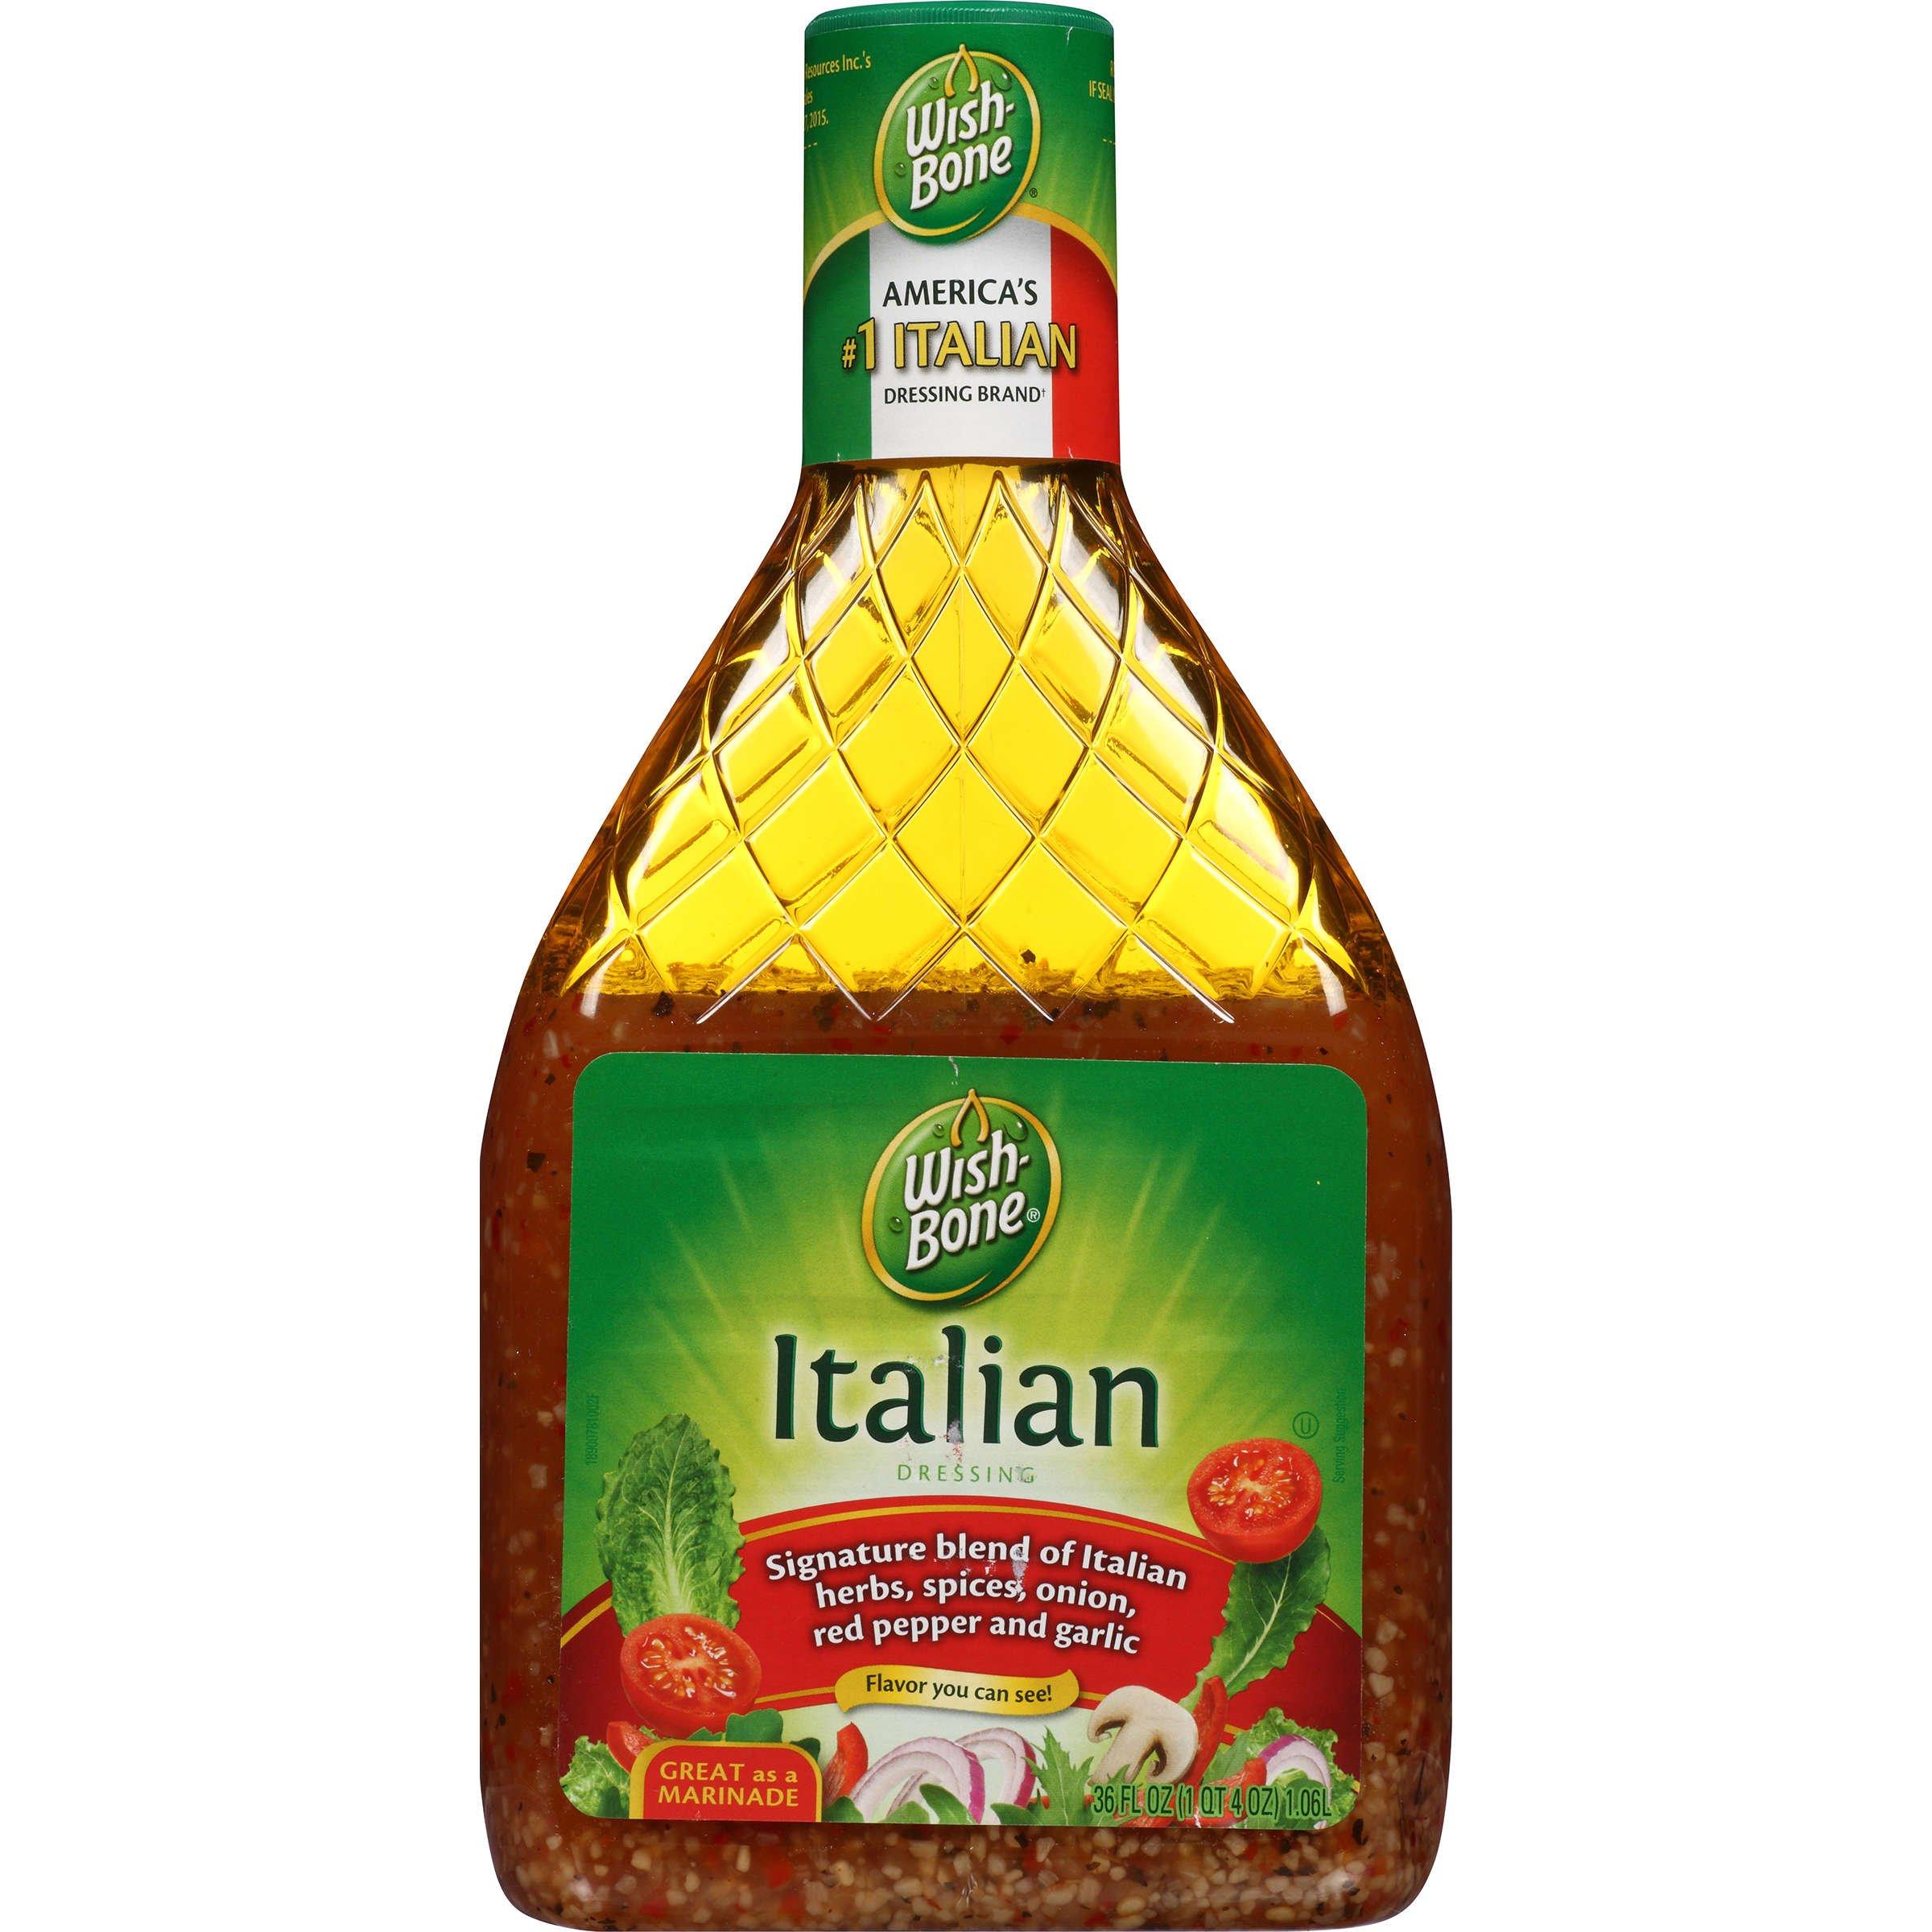 Wish-Bone Salad Dressing, Italian, 36 Ounce (Pack of 6)